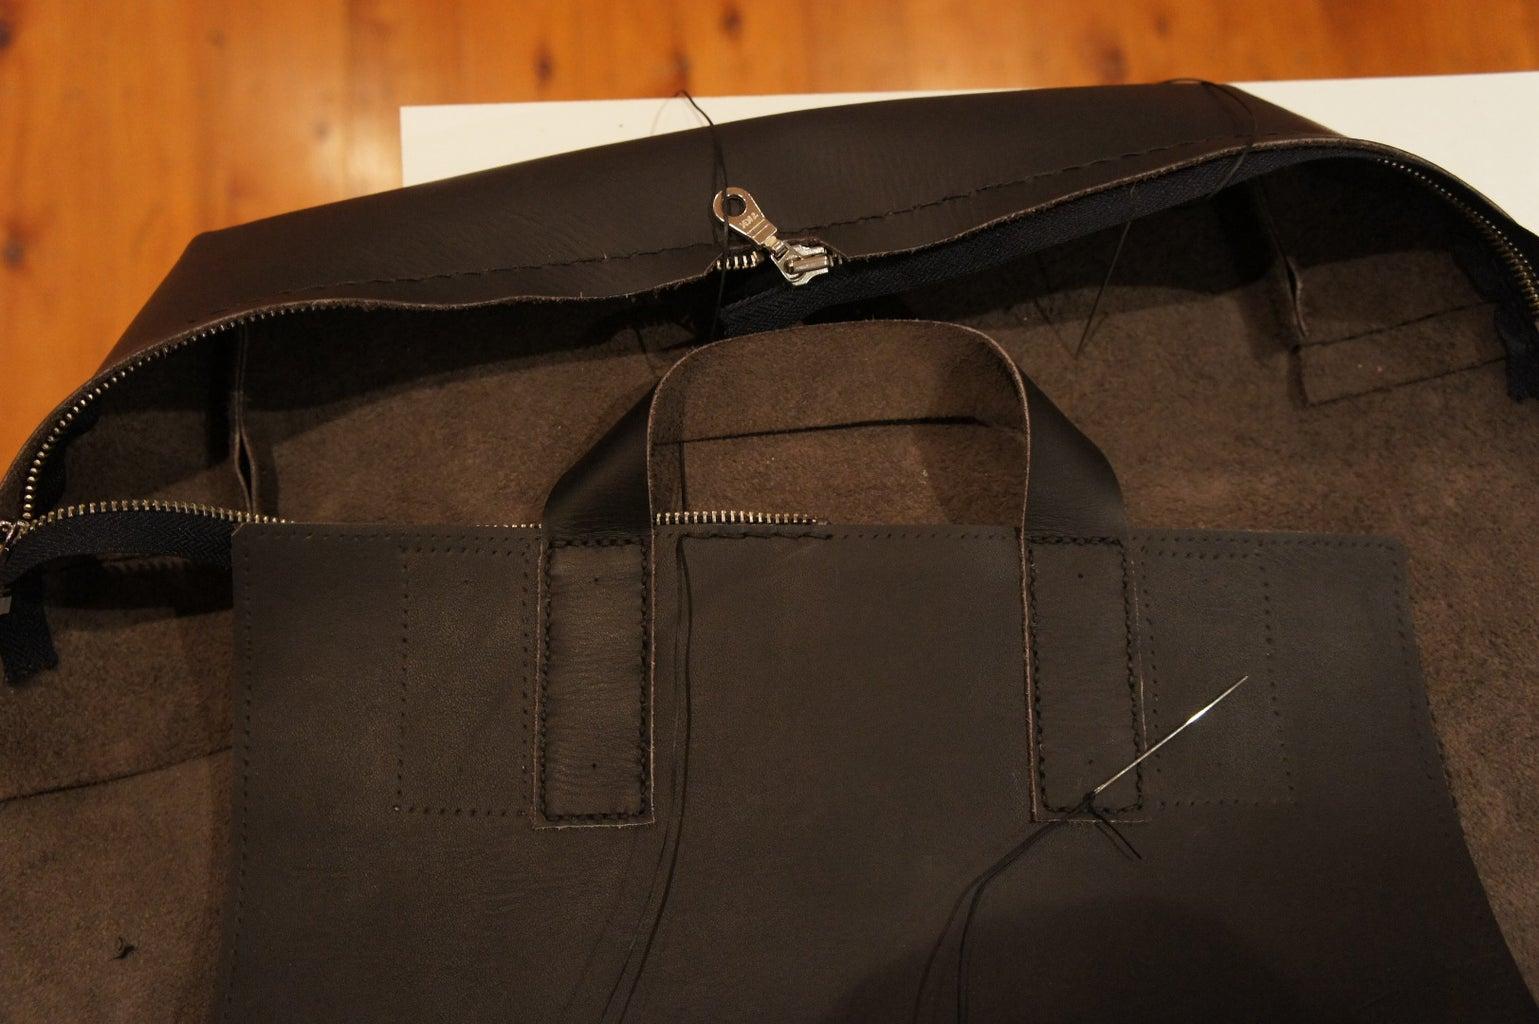 Back Panel: Attaching Lower Shoulder Strap